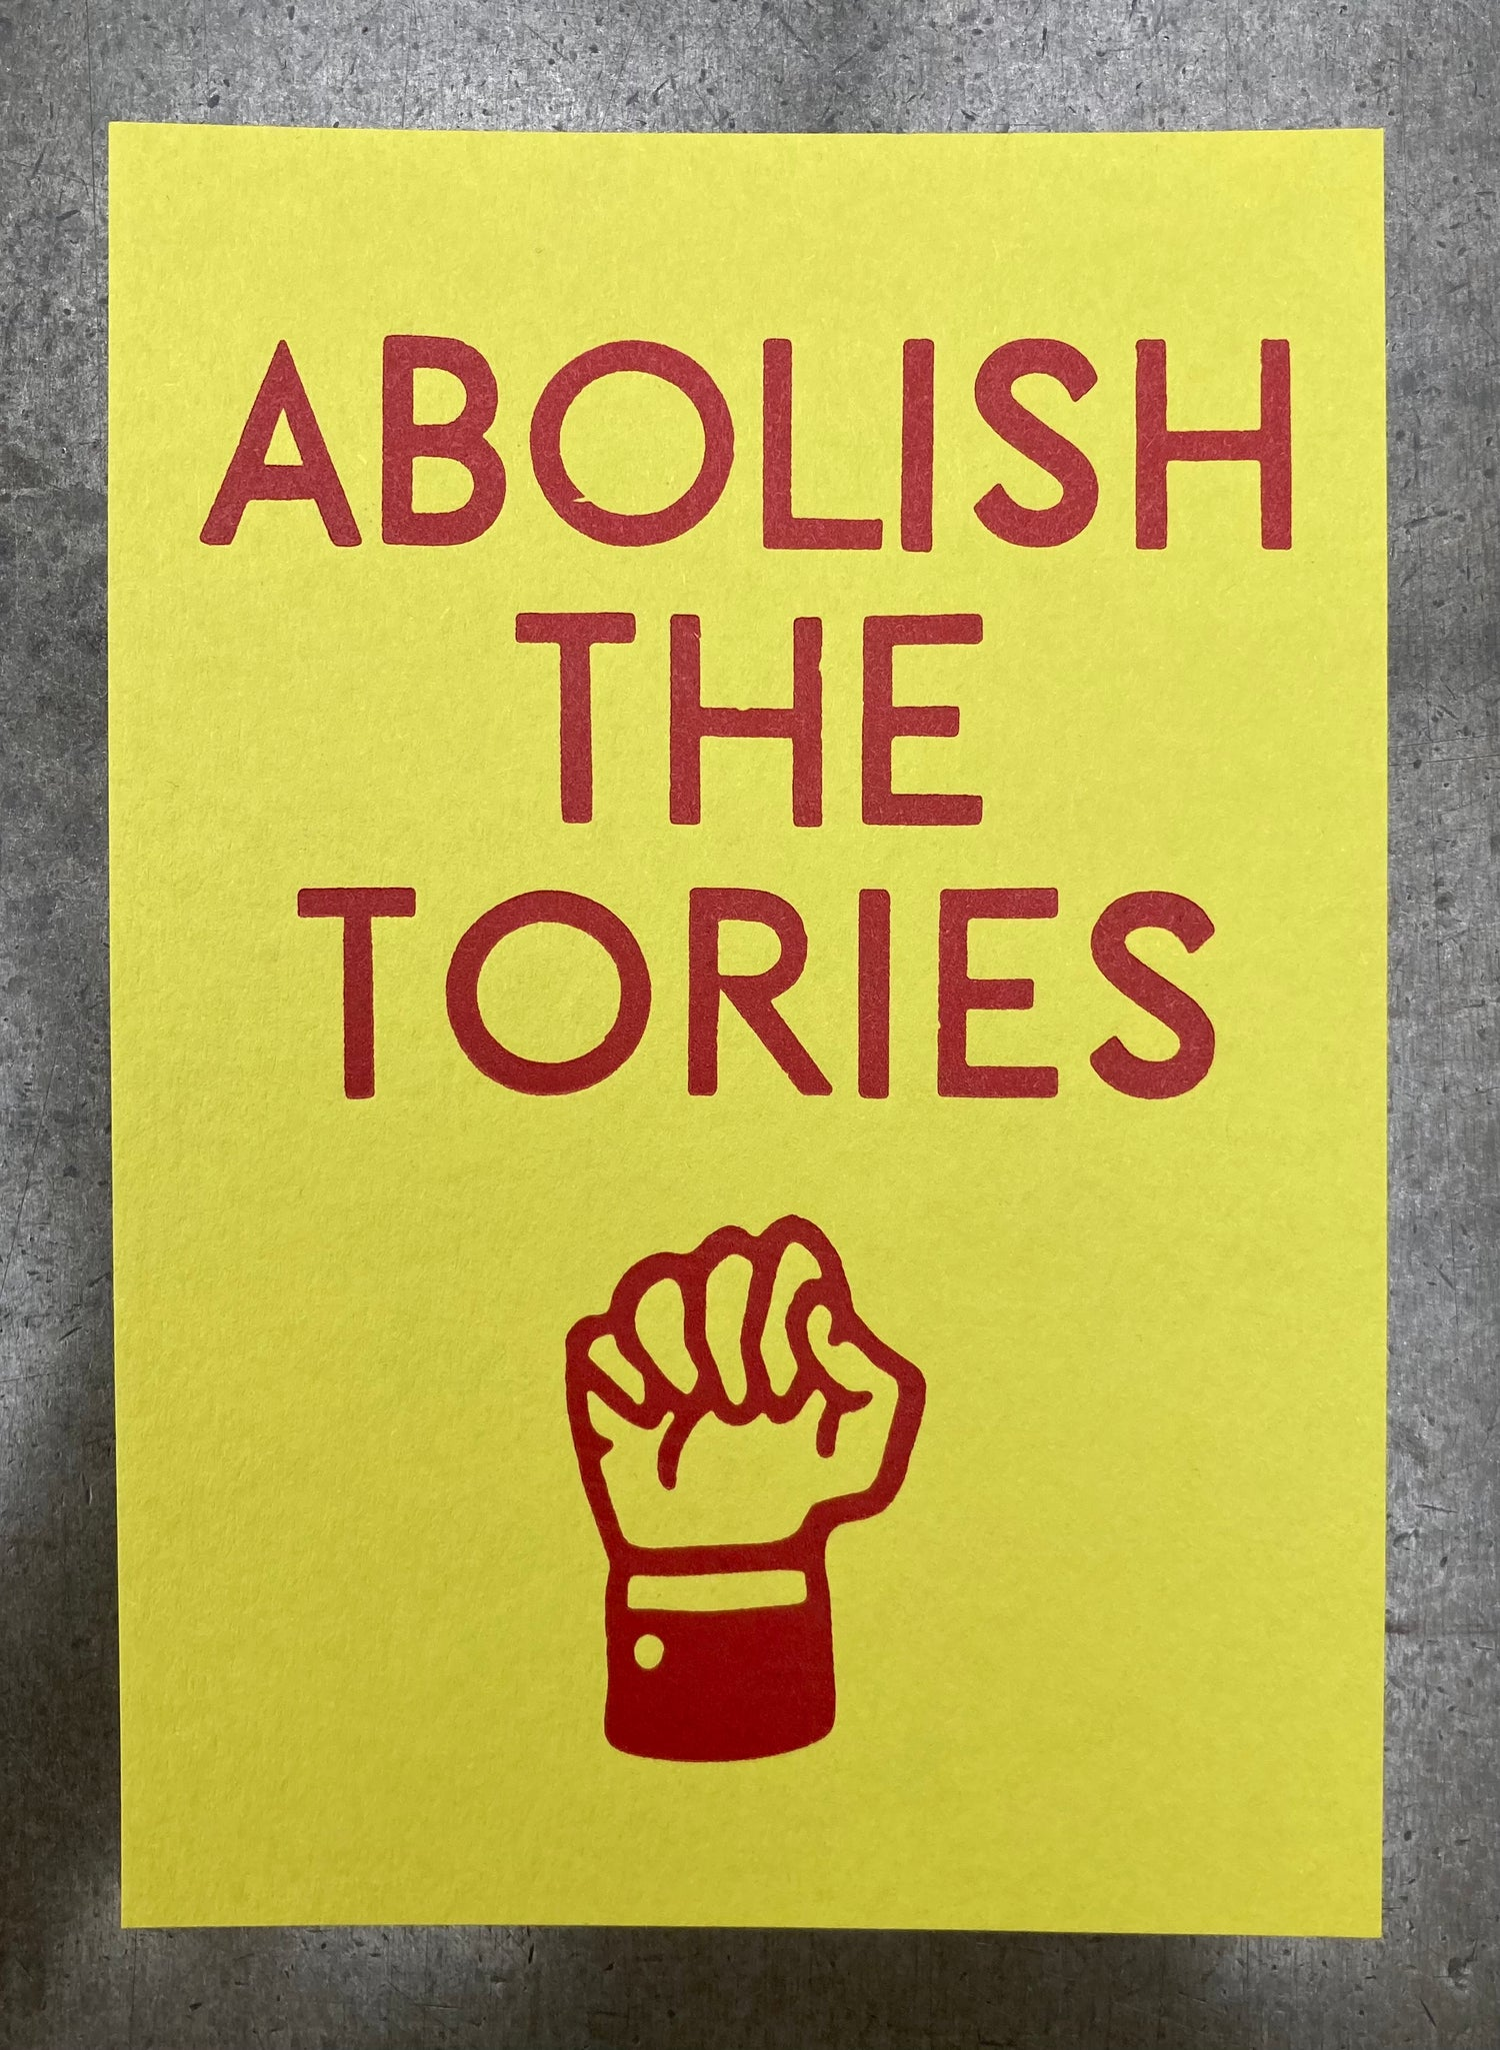 Image of Abolish the Tories – postcard